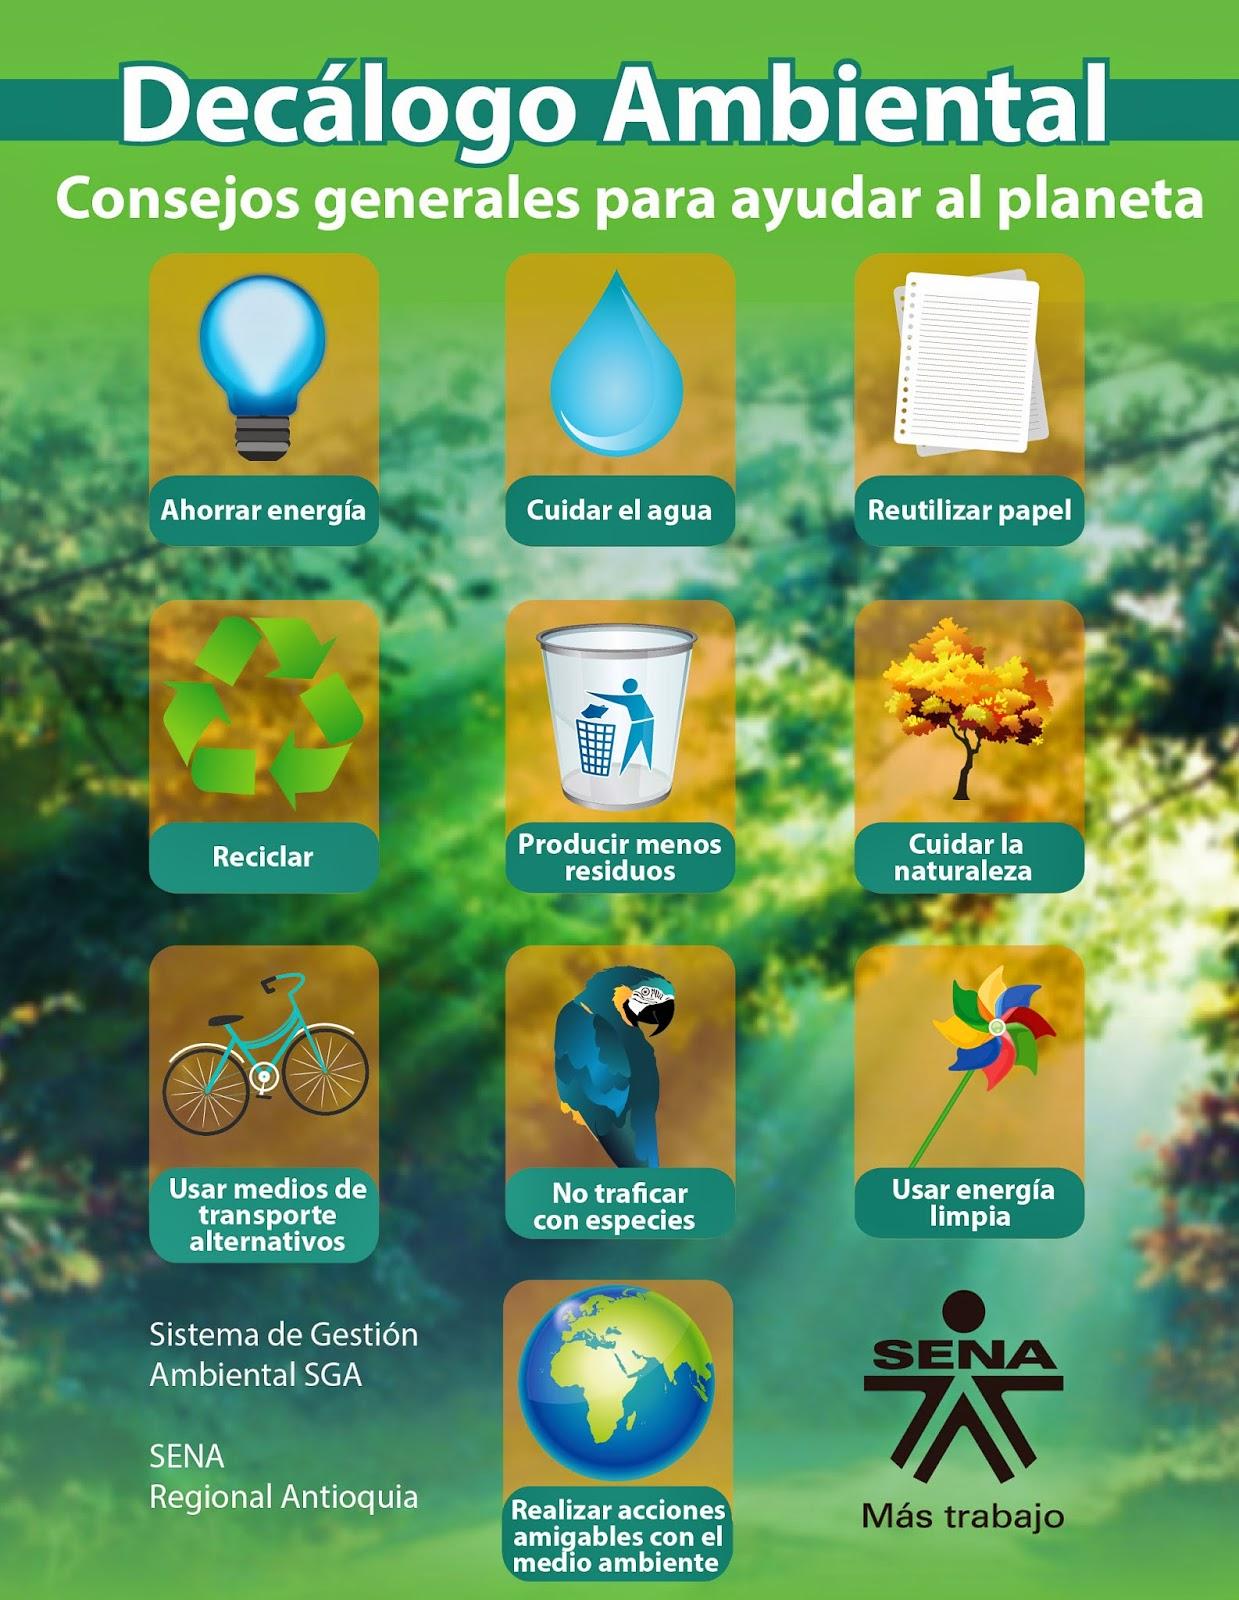 manejo ambiental  dec u00e1logo ambiental